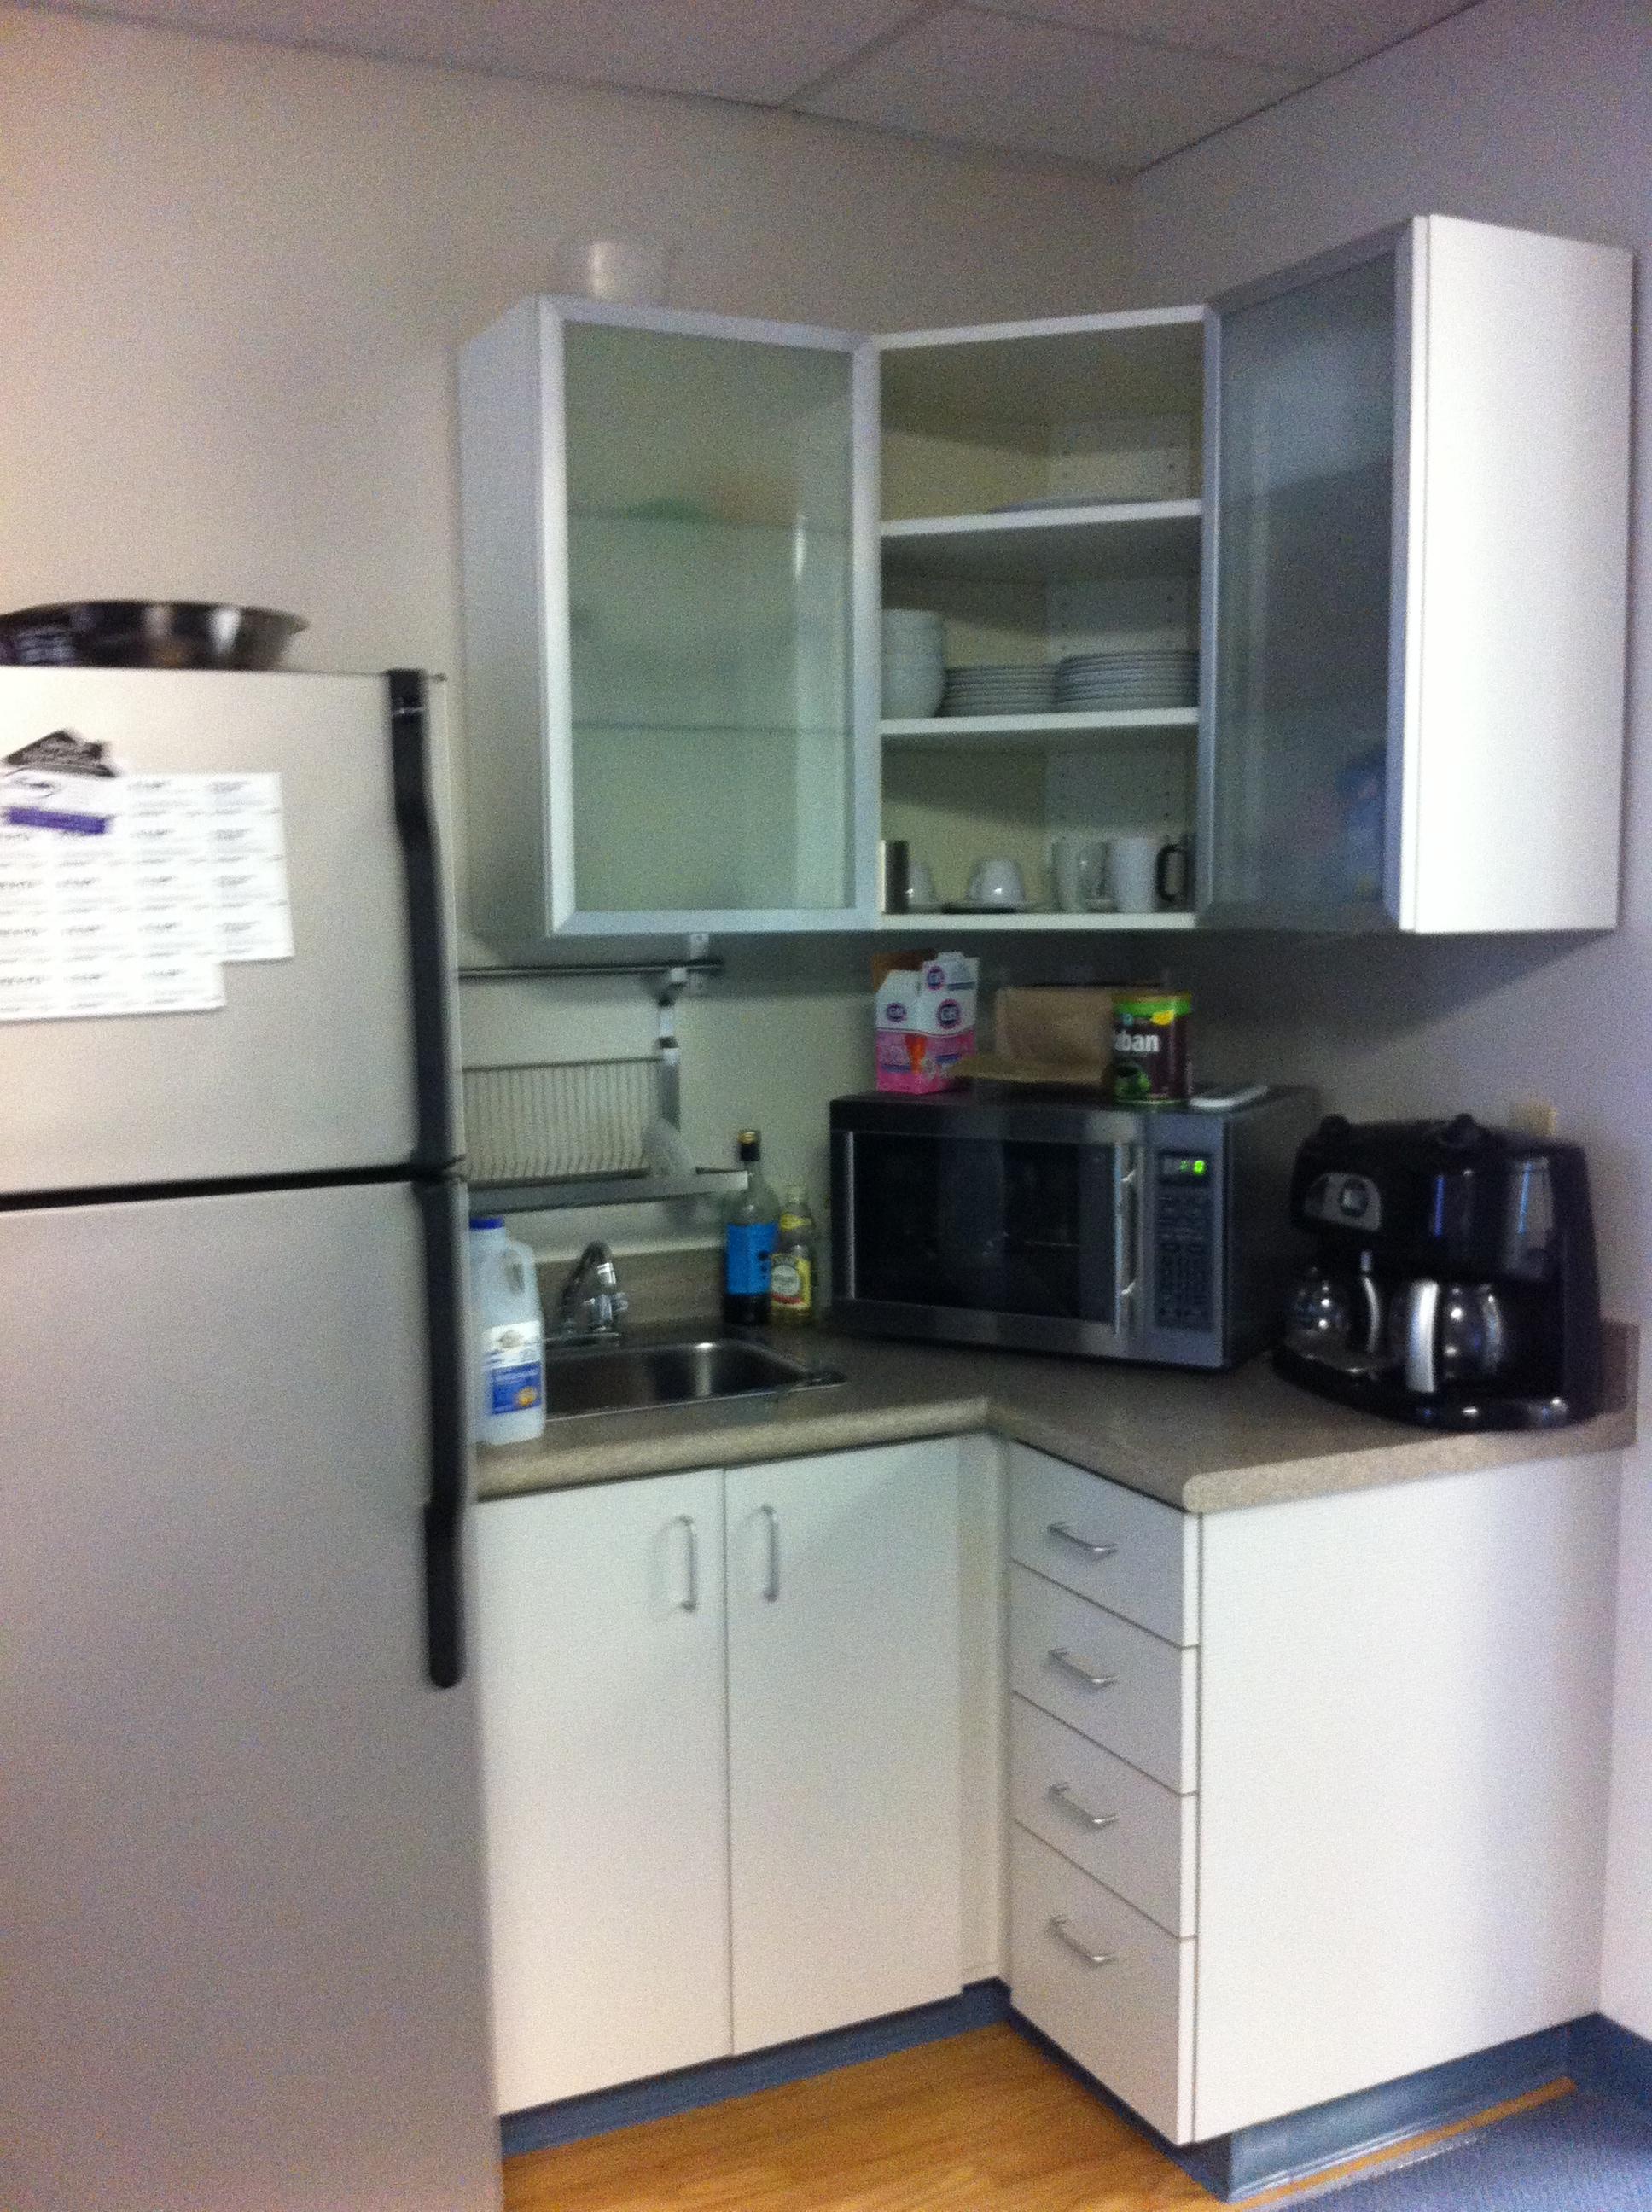 Kitchennette - Fridge not included